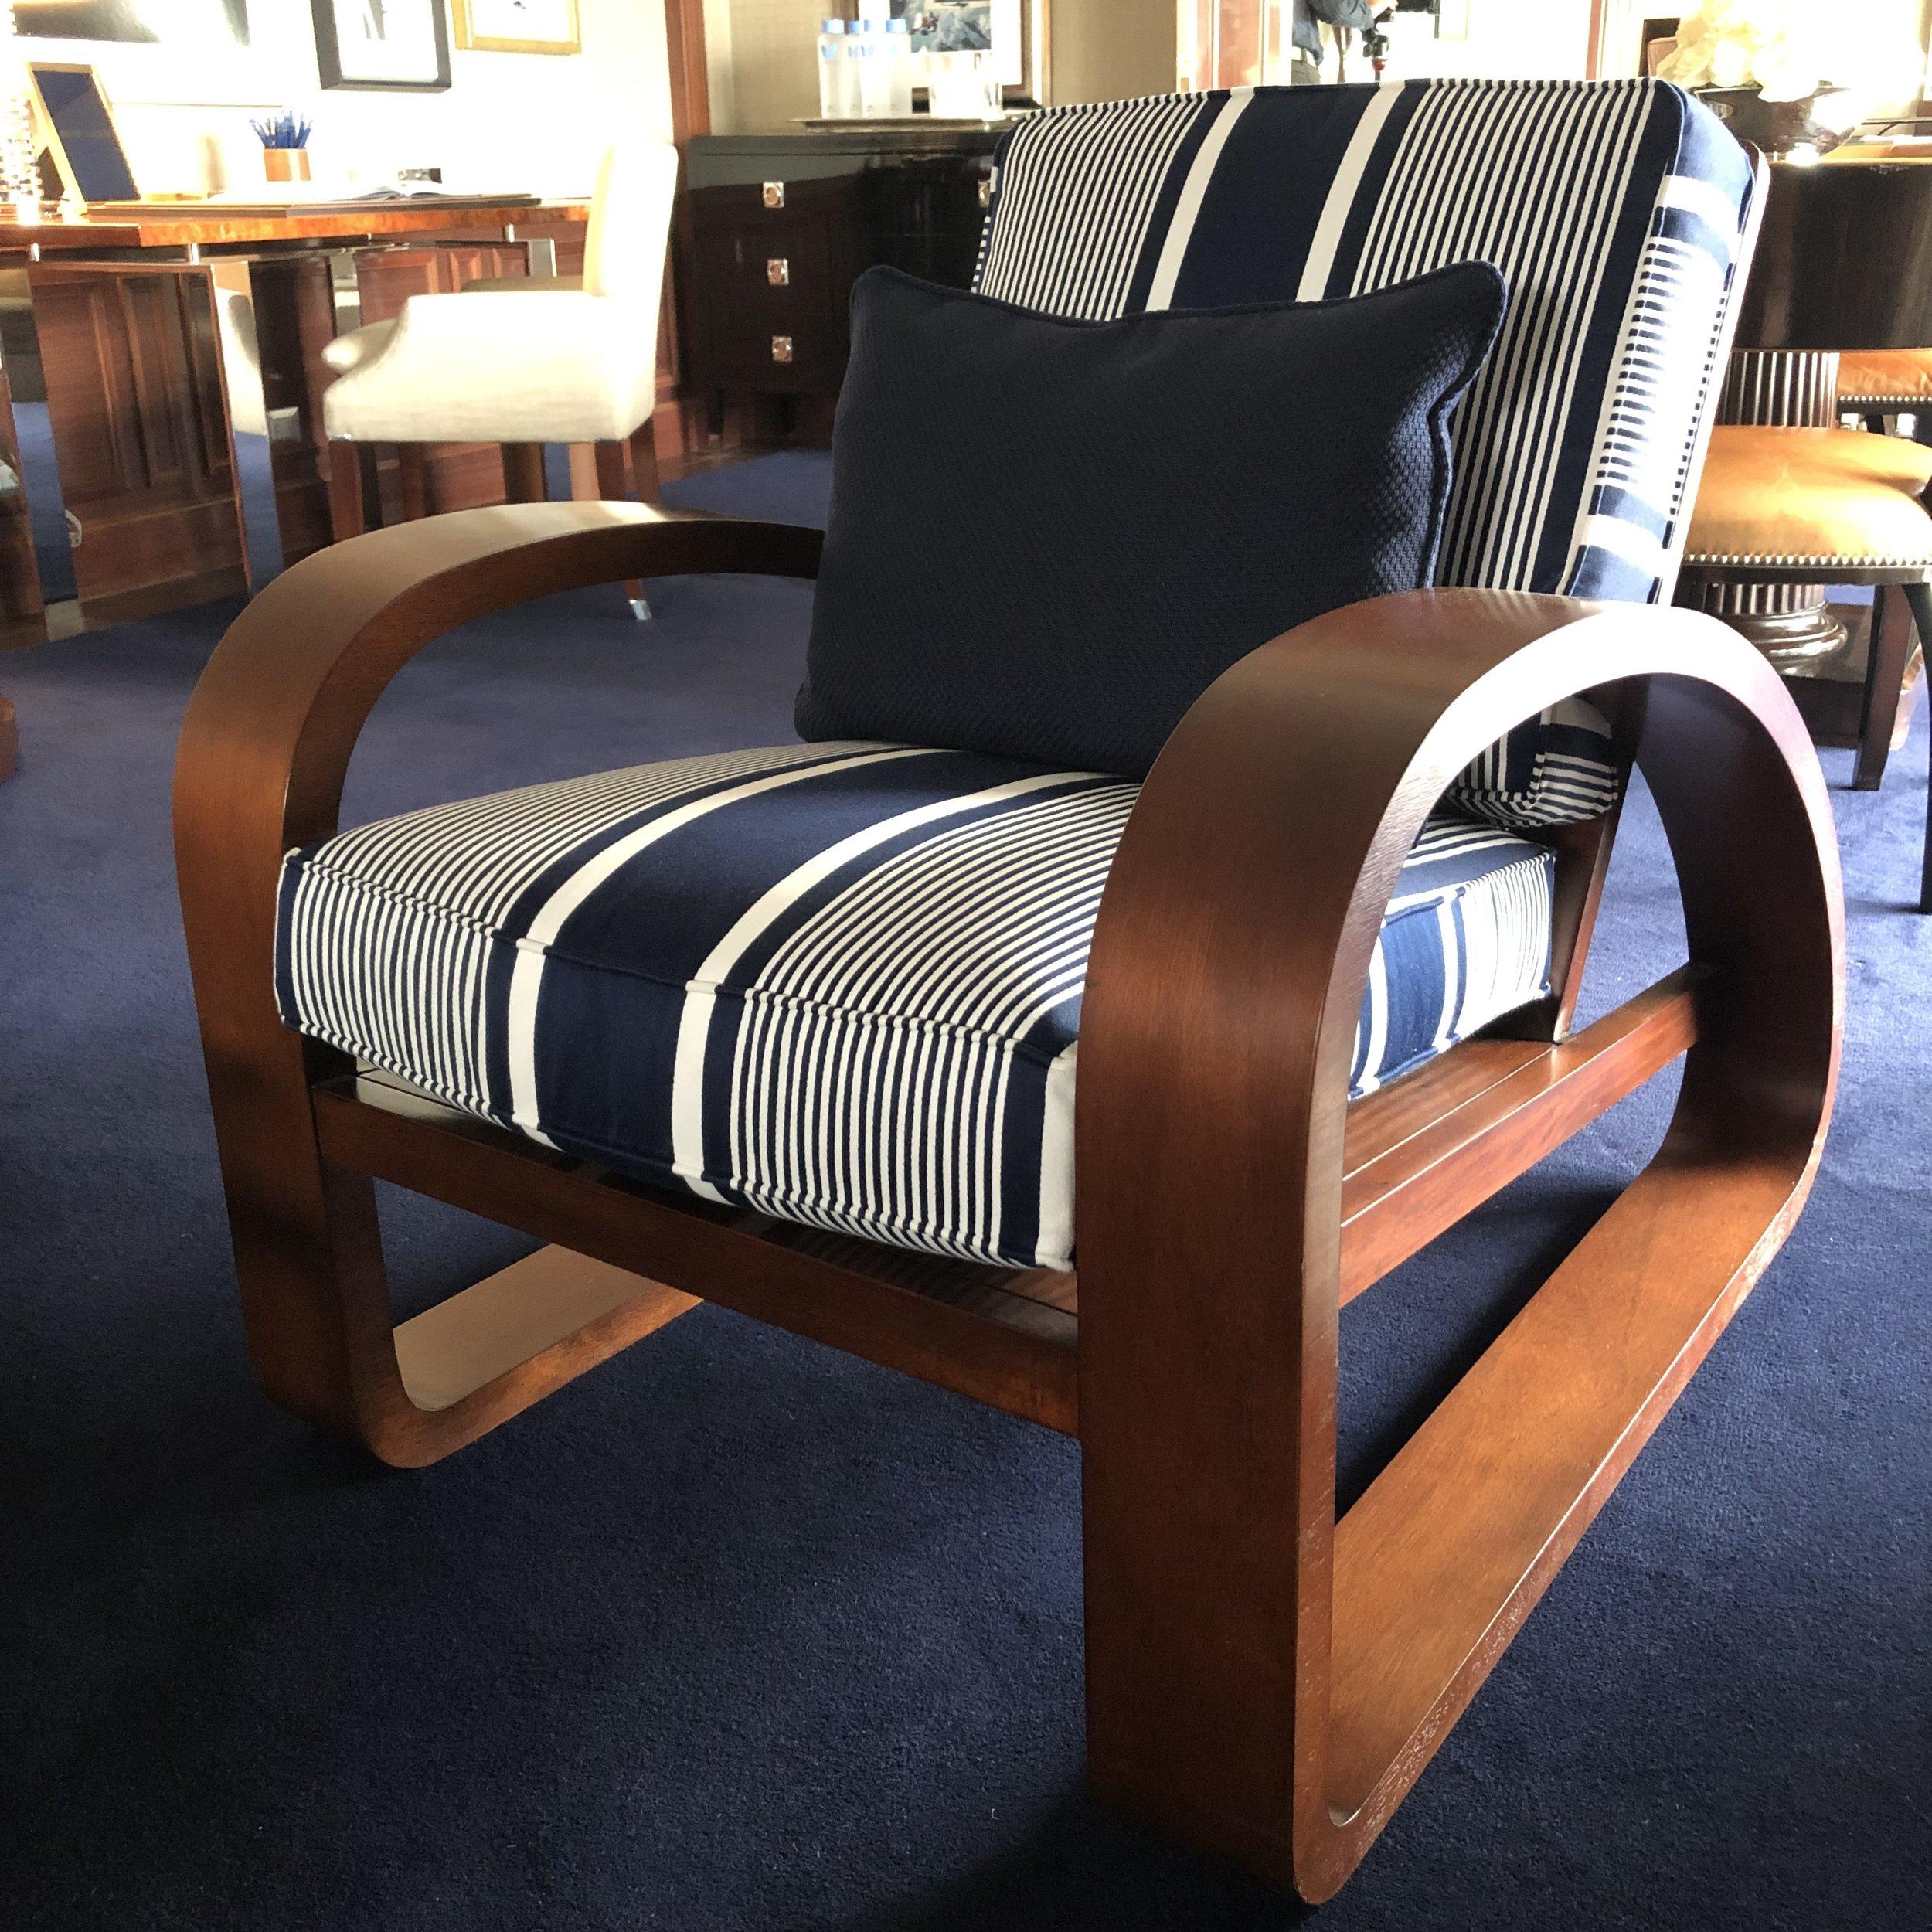 Riviera Final Shots Living Room Yacht Stripe Chair.jpg